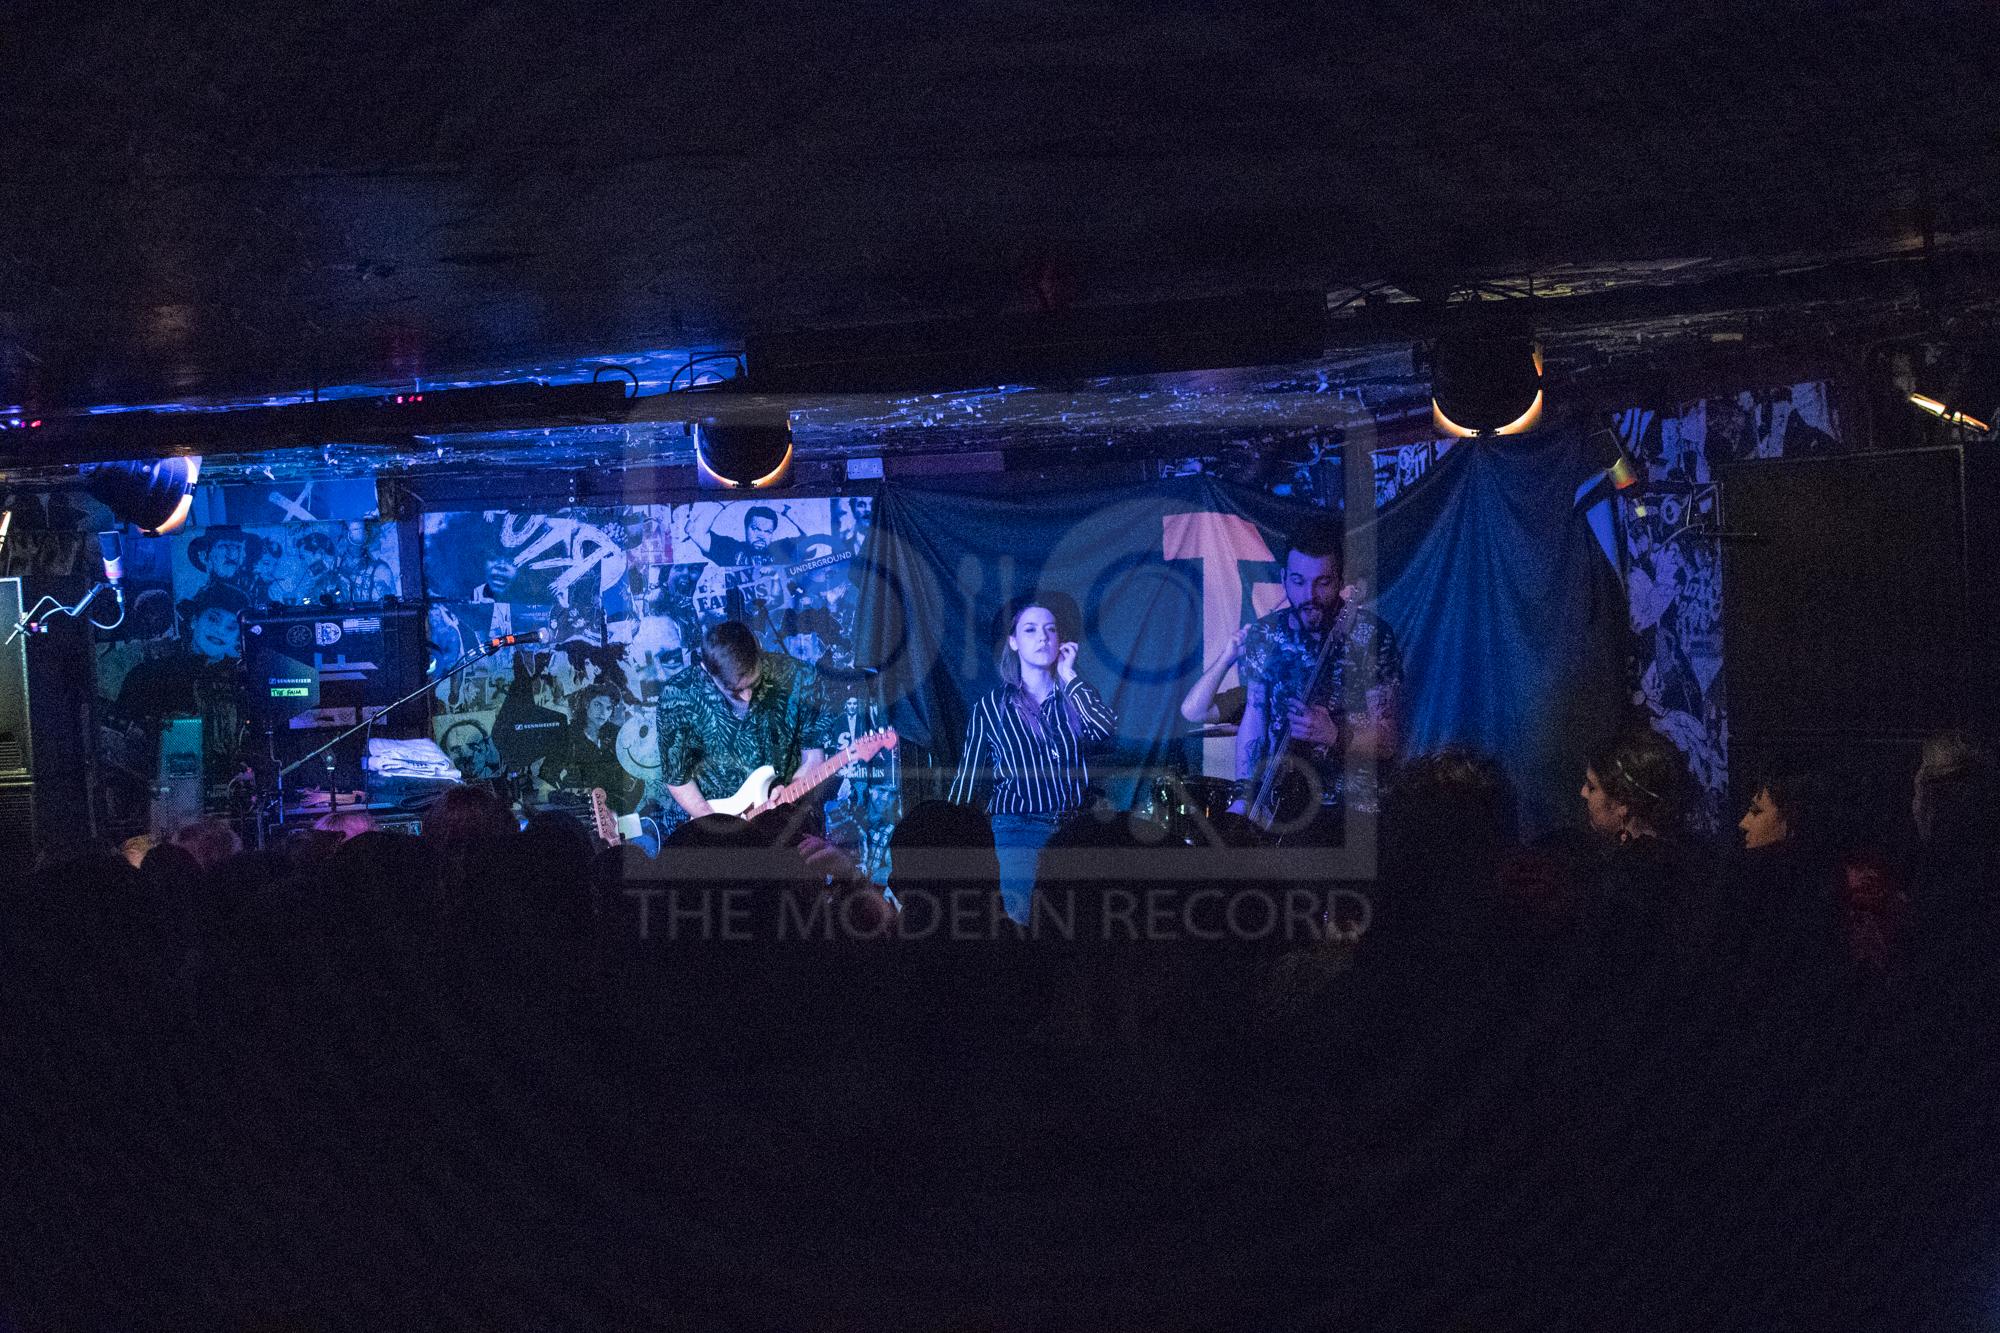 3 - Halflives - THINKTANK, Newcastle - 4-02-19 Picture by Will Gorman Photo.JPG